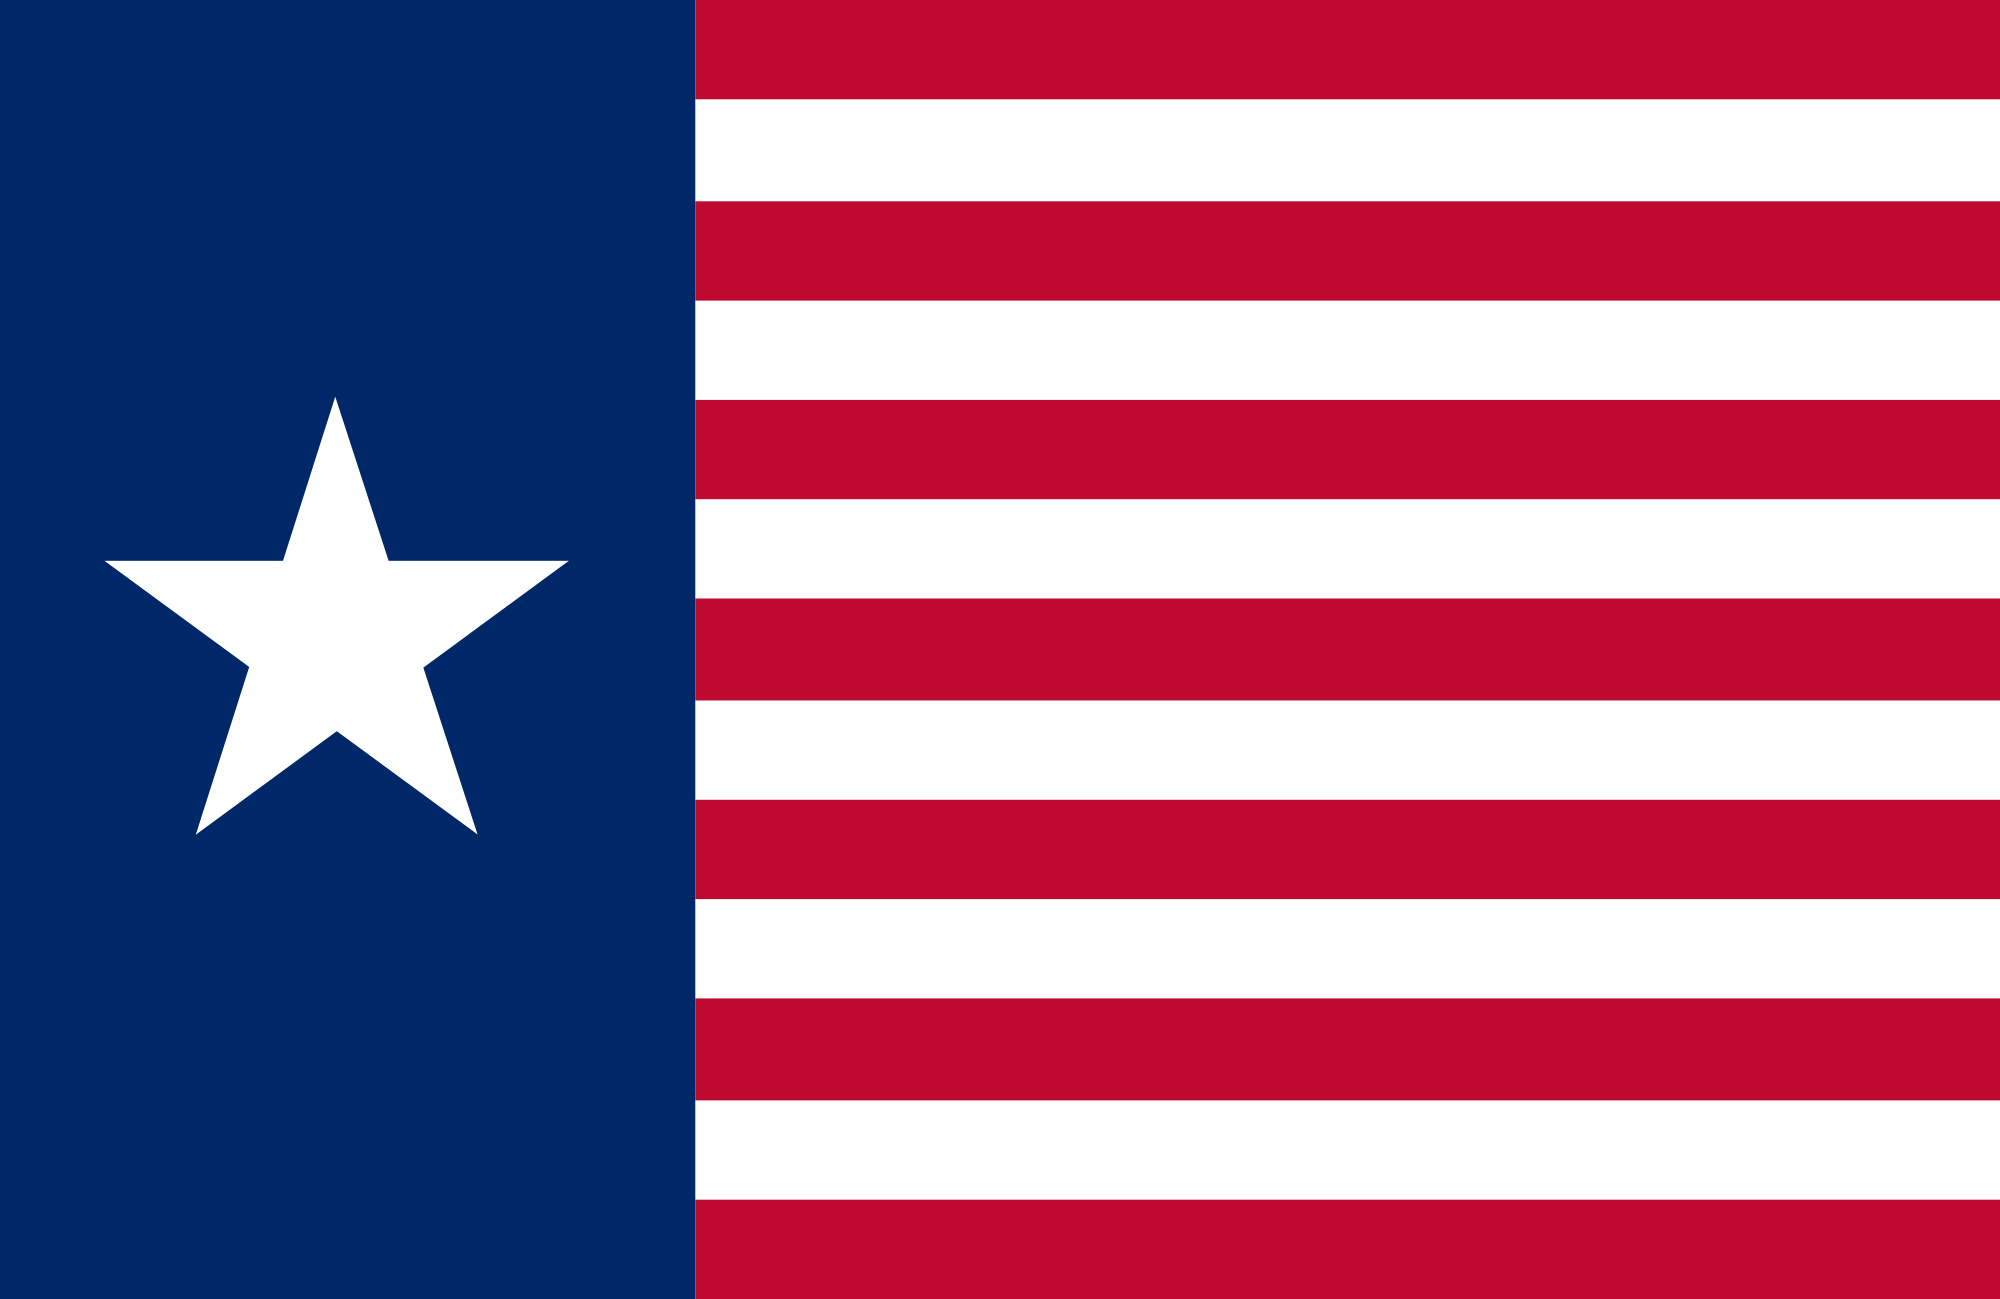 Ceremonial Flag Of The Texas Navy Association Flag Texas Navy Flags Of The World